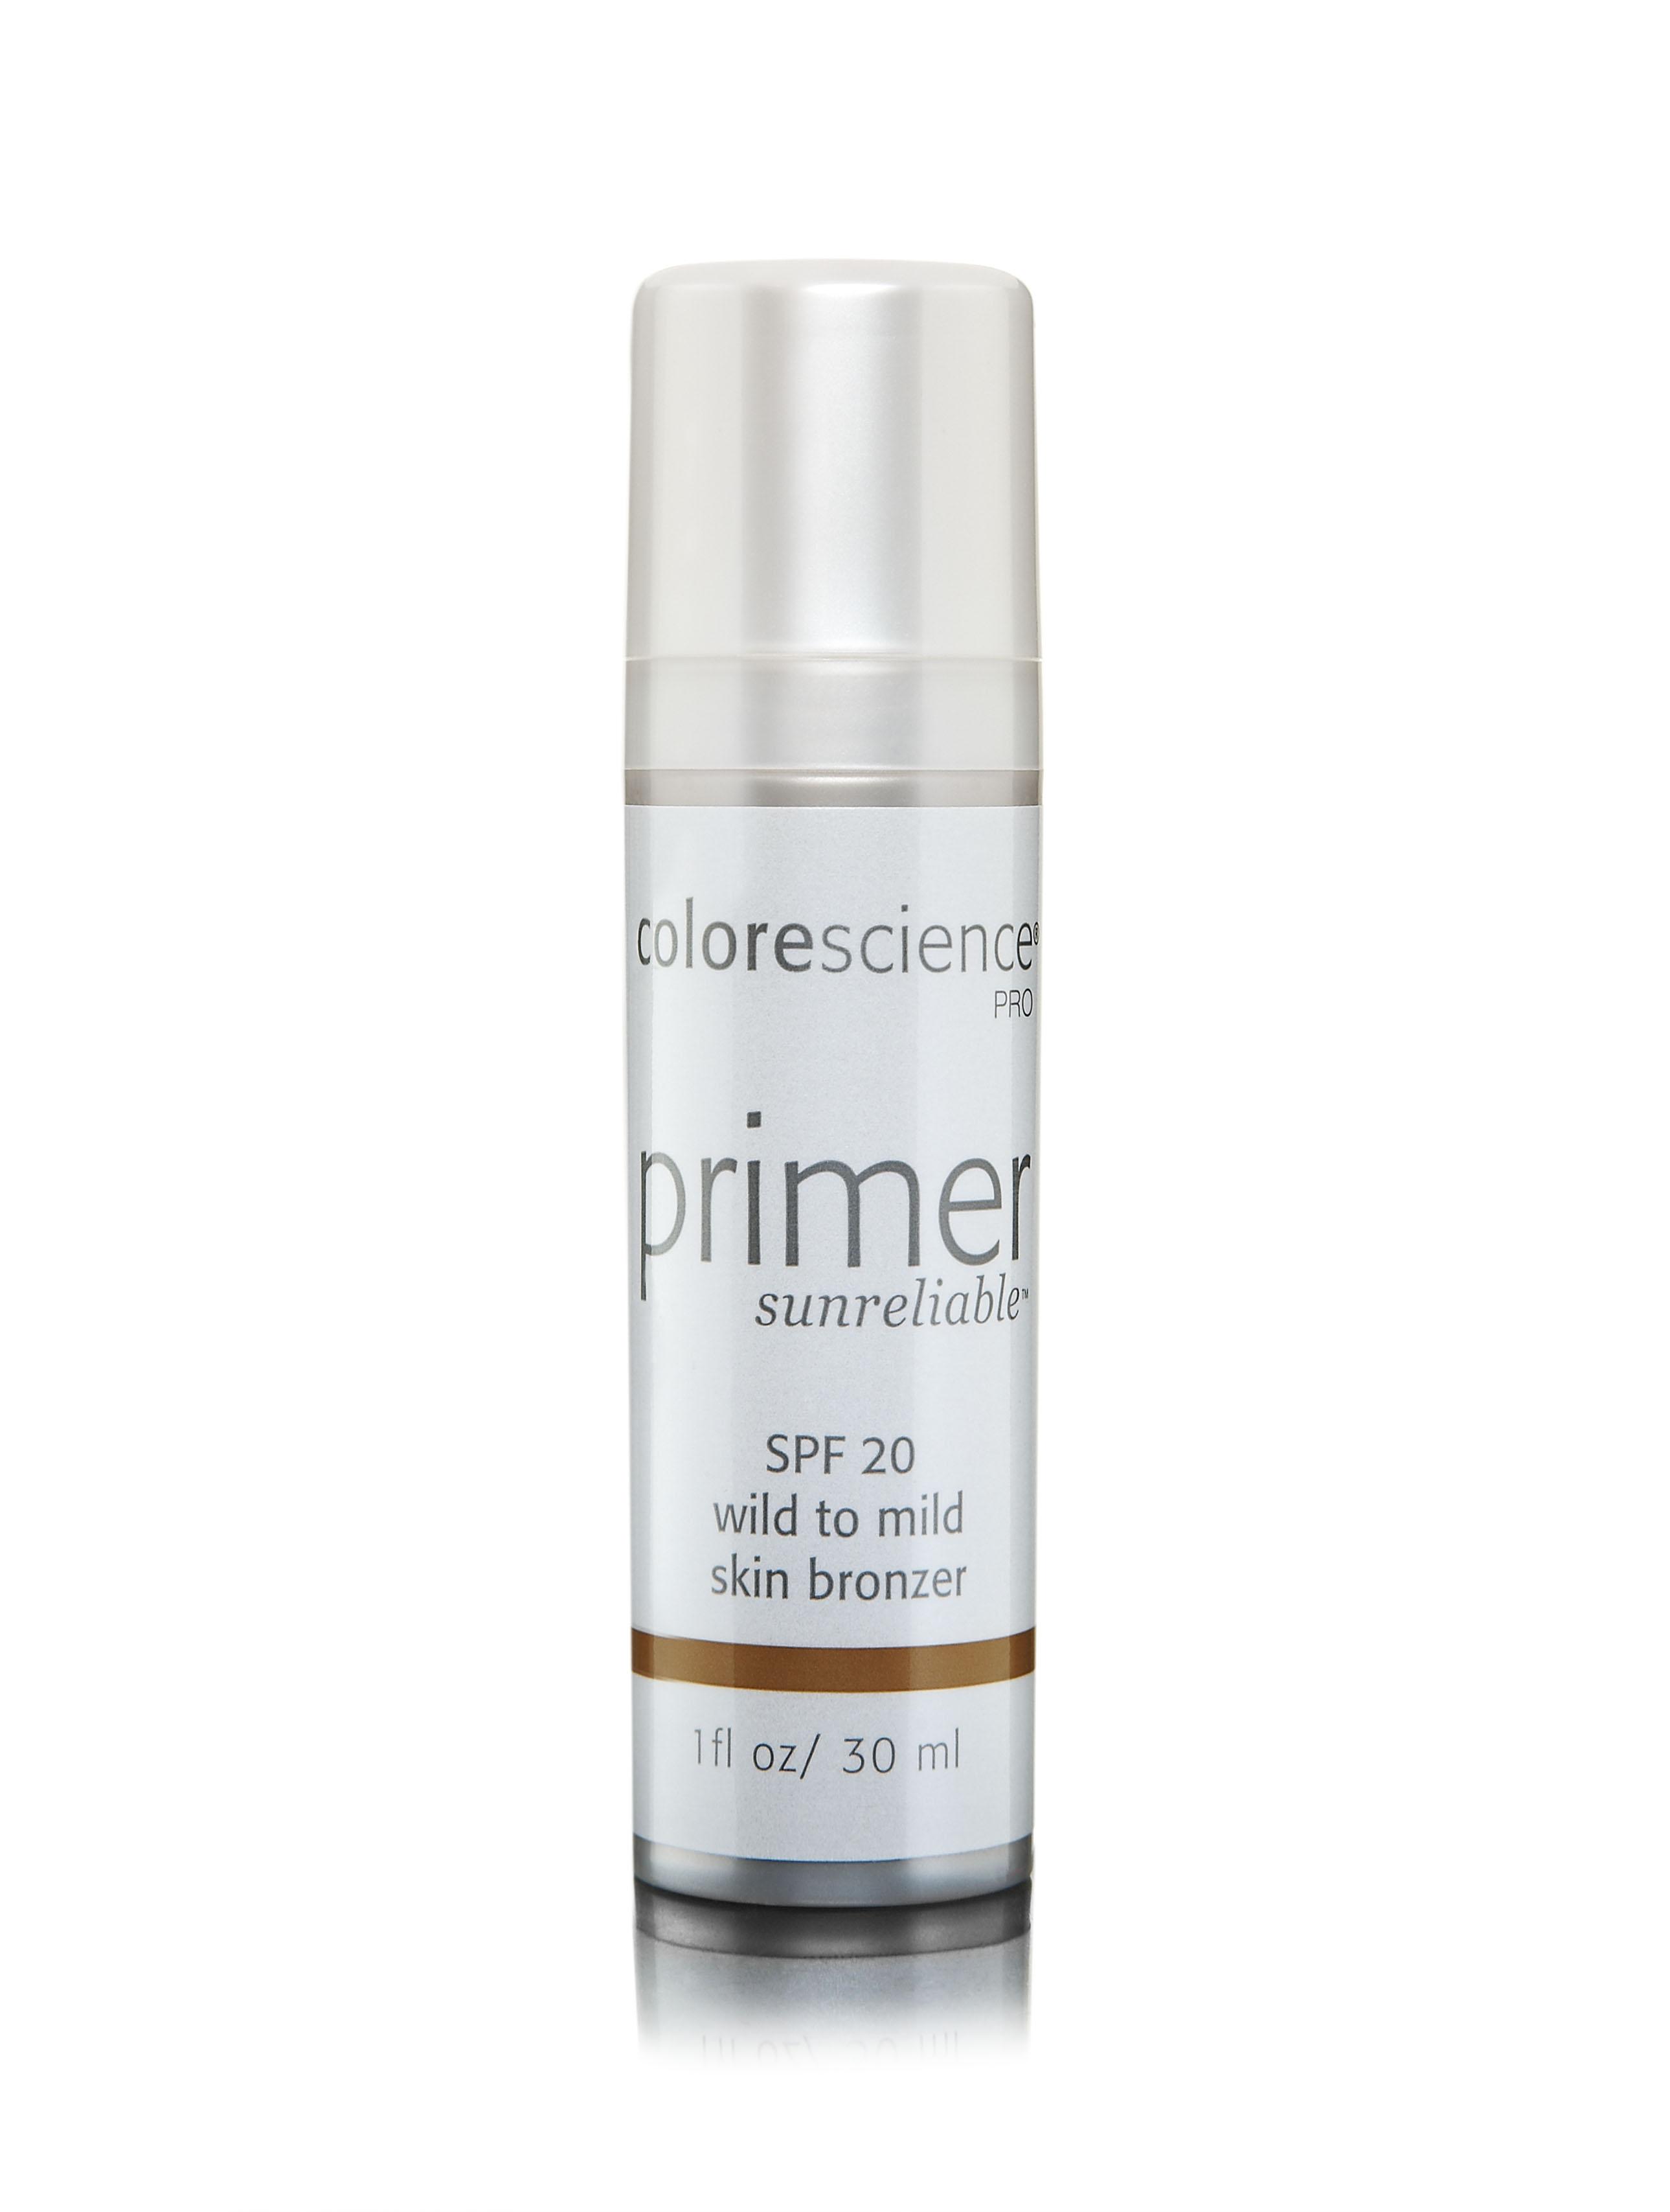 Colorescience_Primer_Skin Bronzing_W2M.jpg